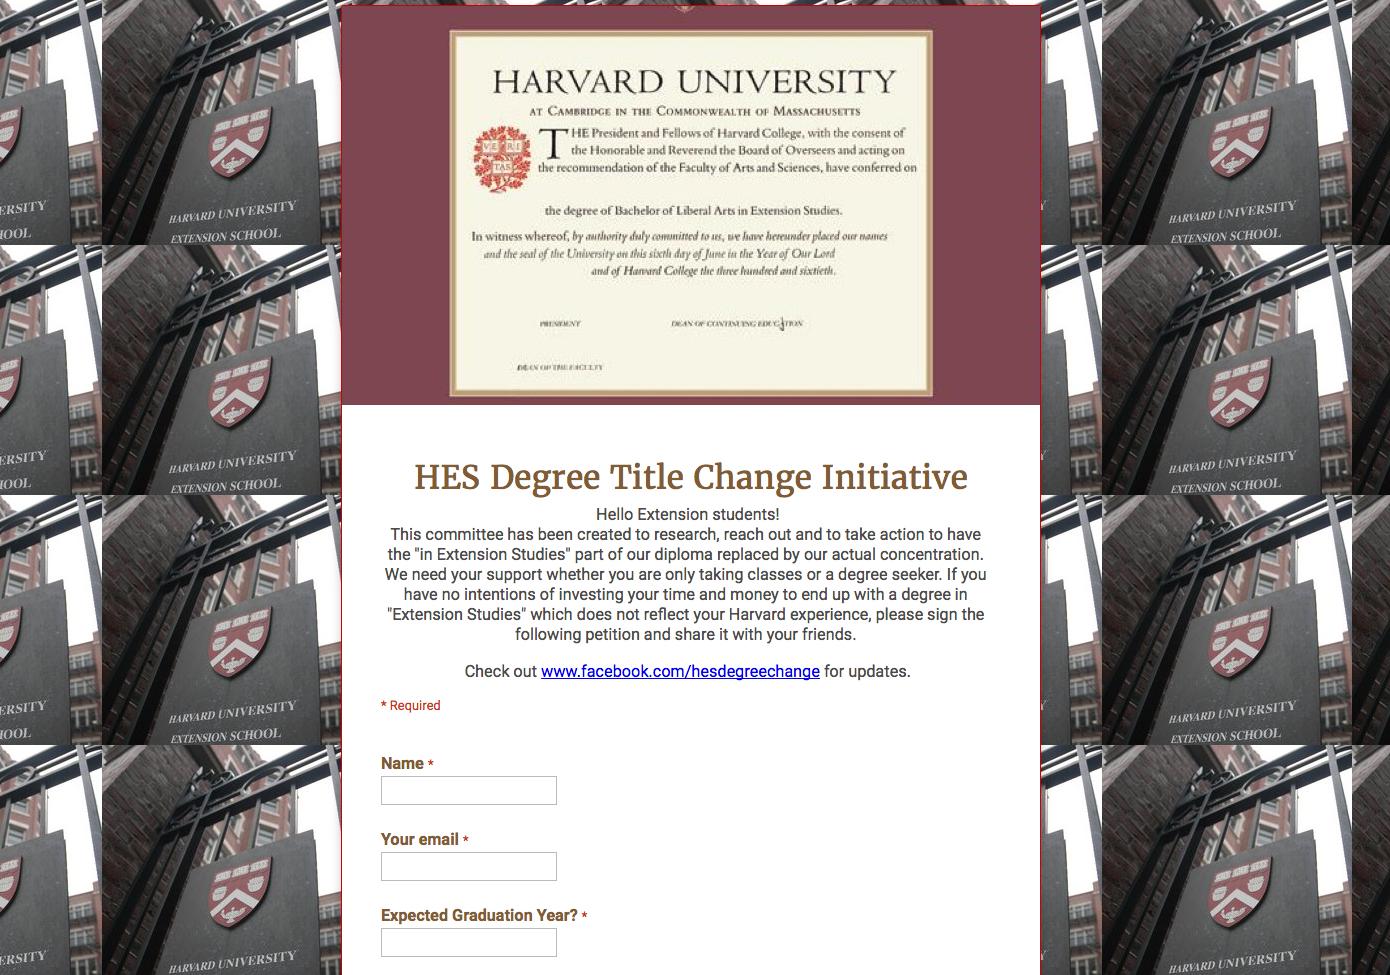 Harvard extension school alm thesis